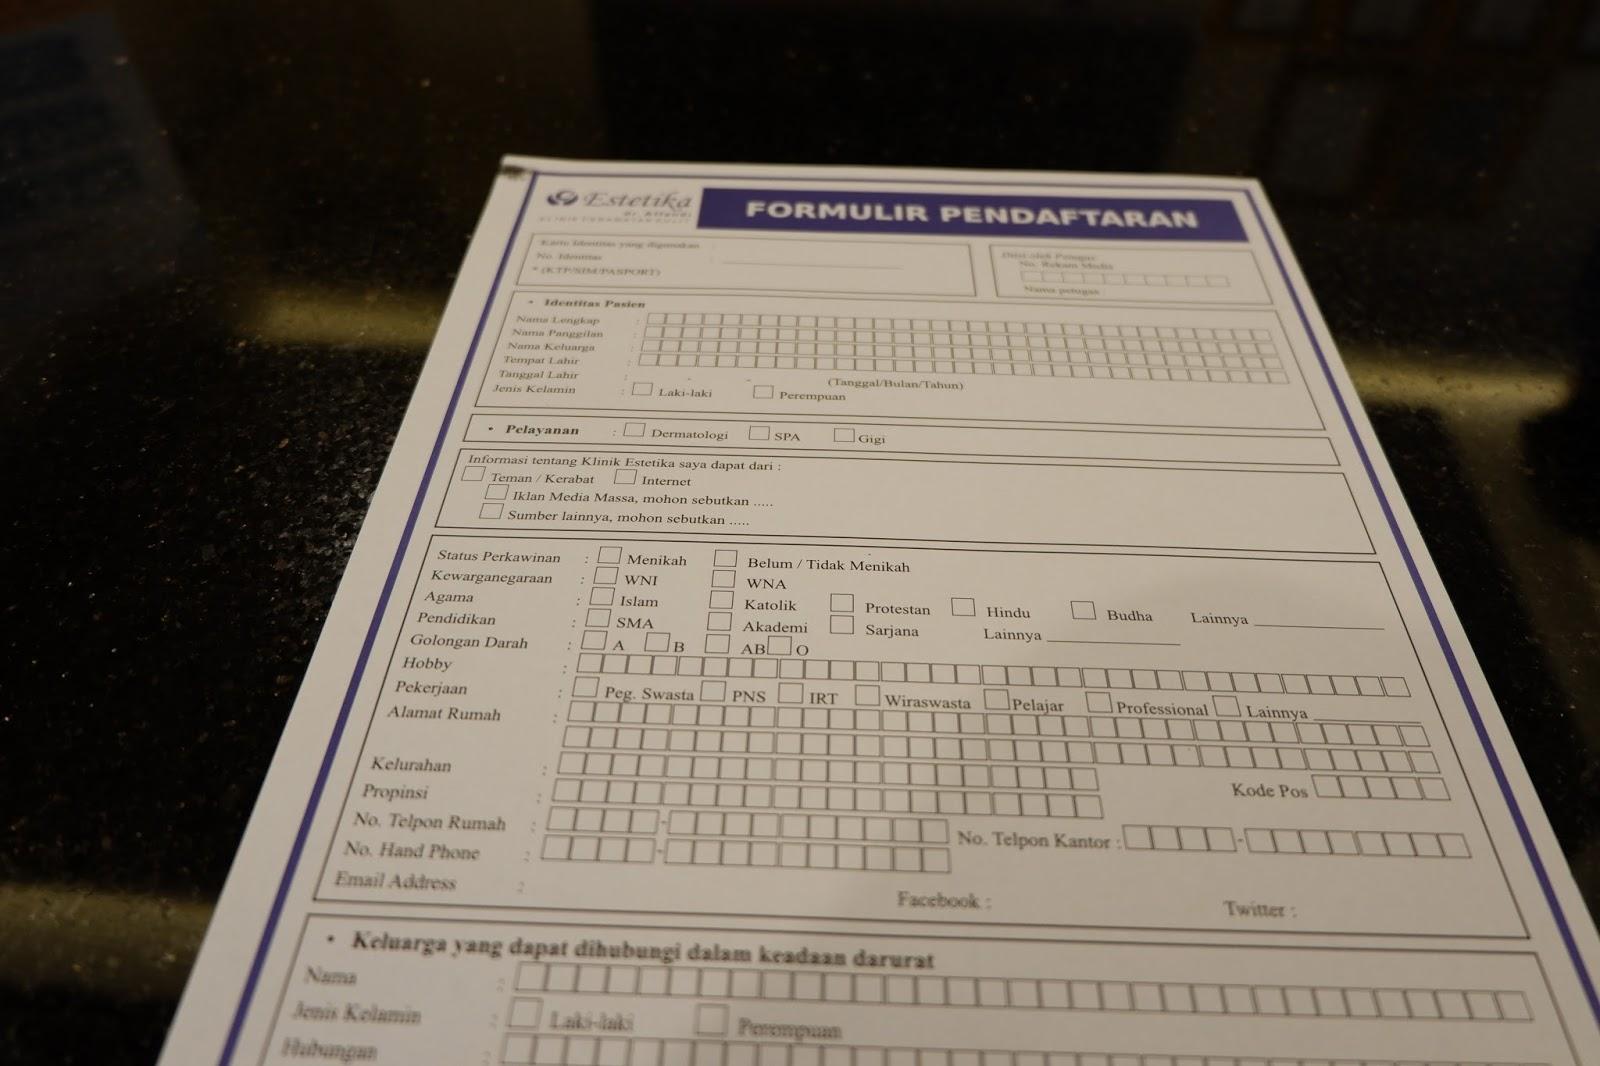 PERAWATAN FACIAL DI KLINIK ESTETIKA DR. AFFANDI CABANG DENPASAR